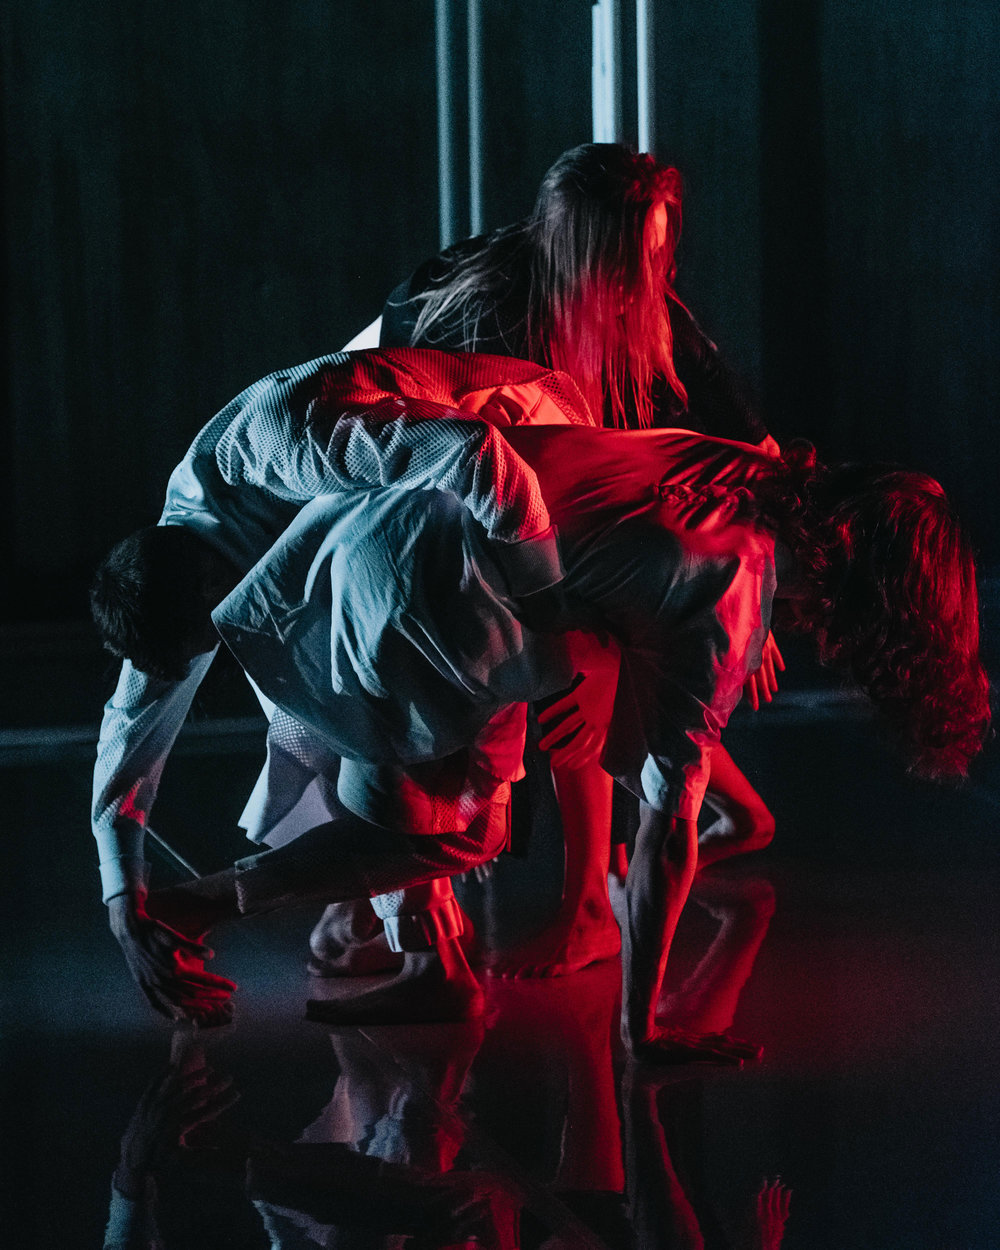 Pylon III, Cornish Playhouse, 2018. Photograph: Stefano Francesco Altamura